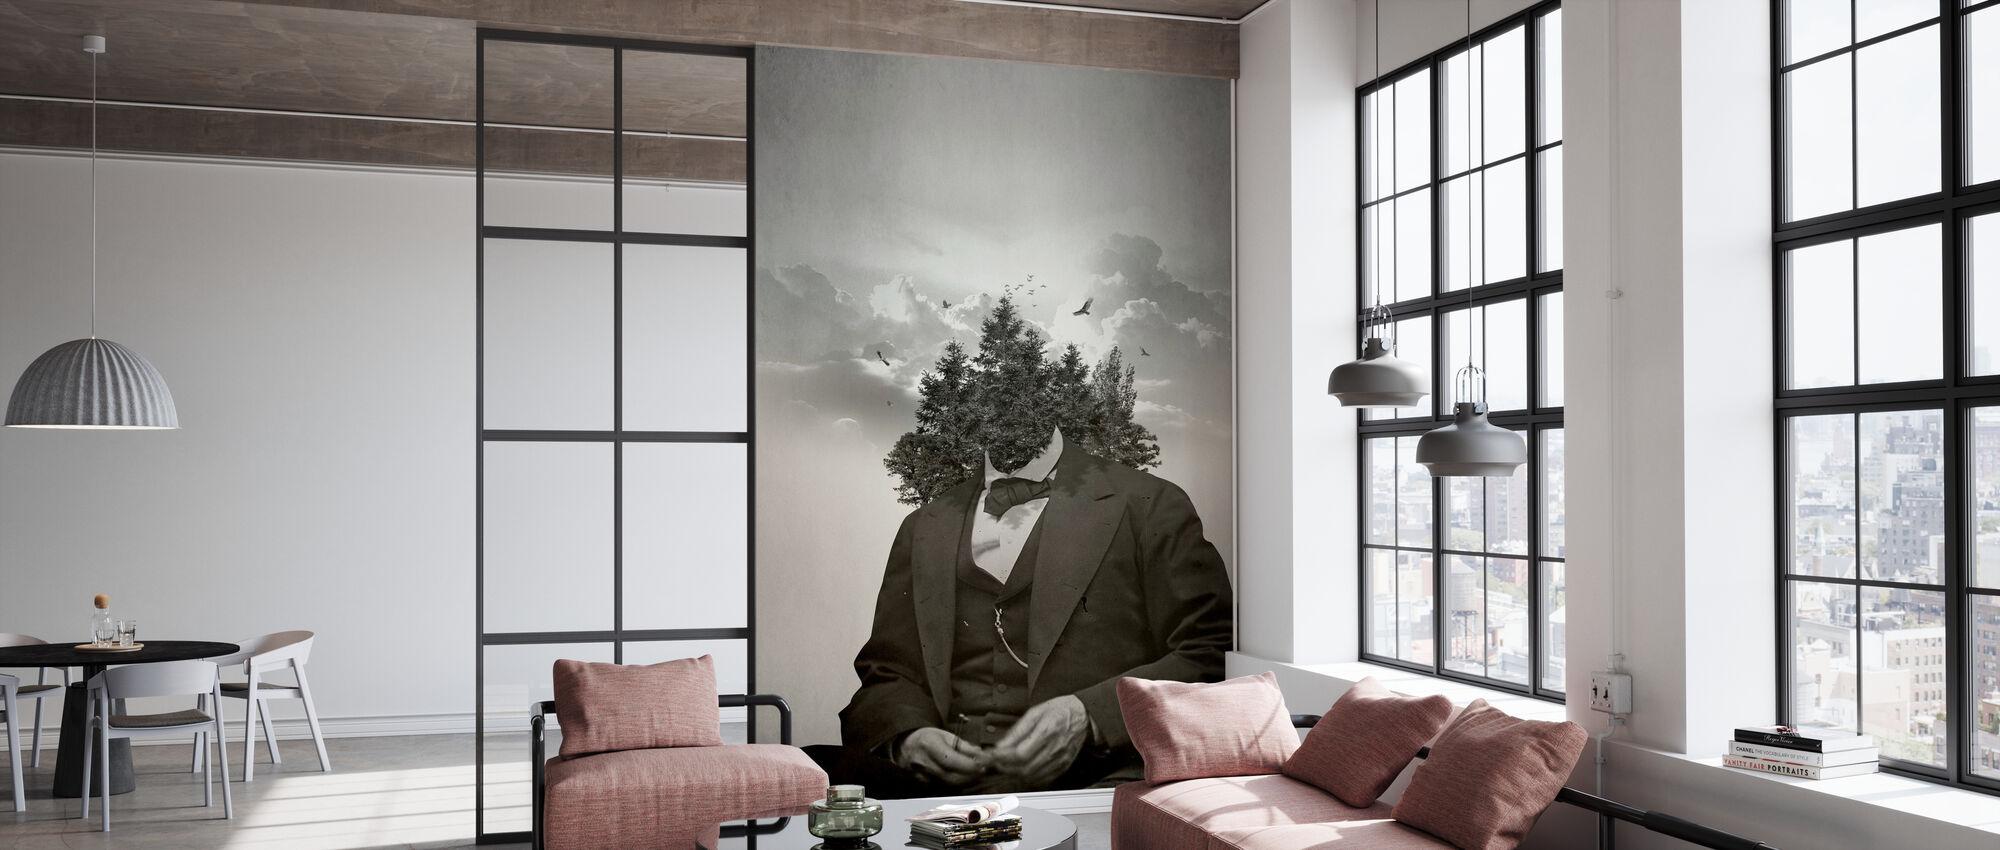 Forest - Wallpaper - Office